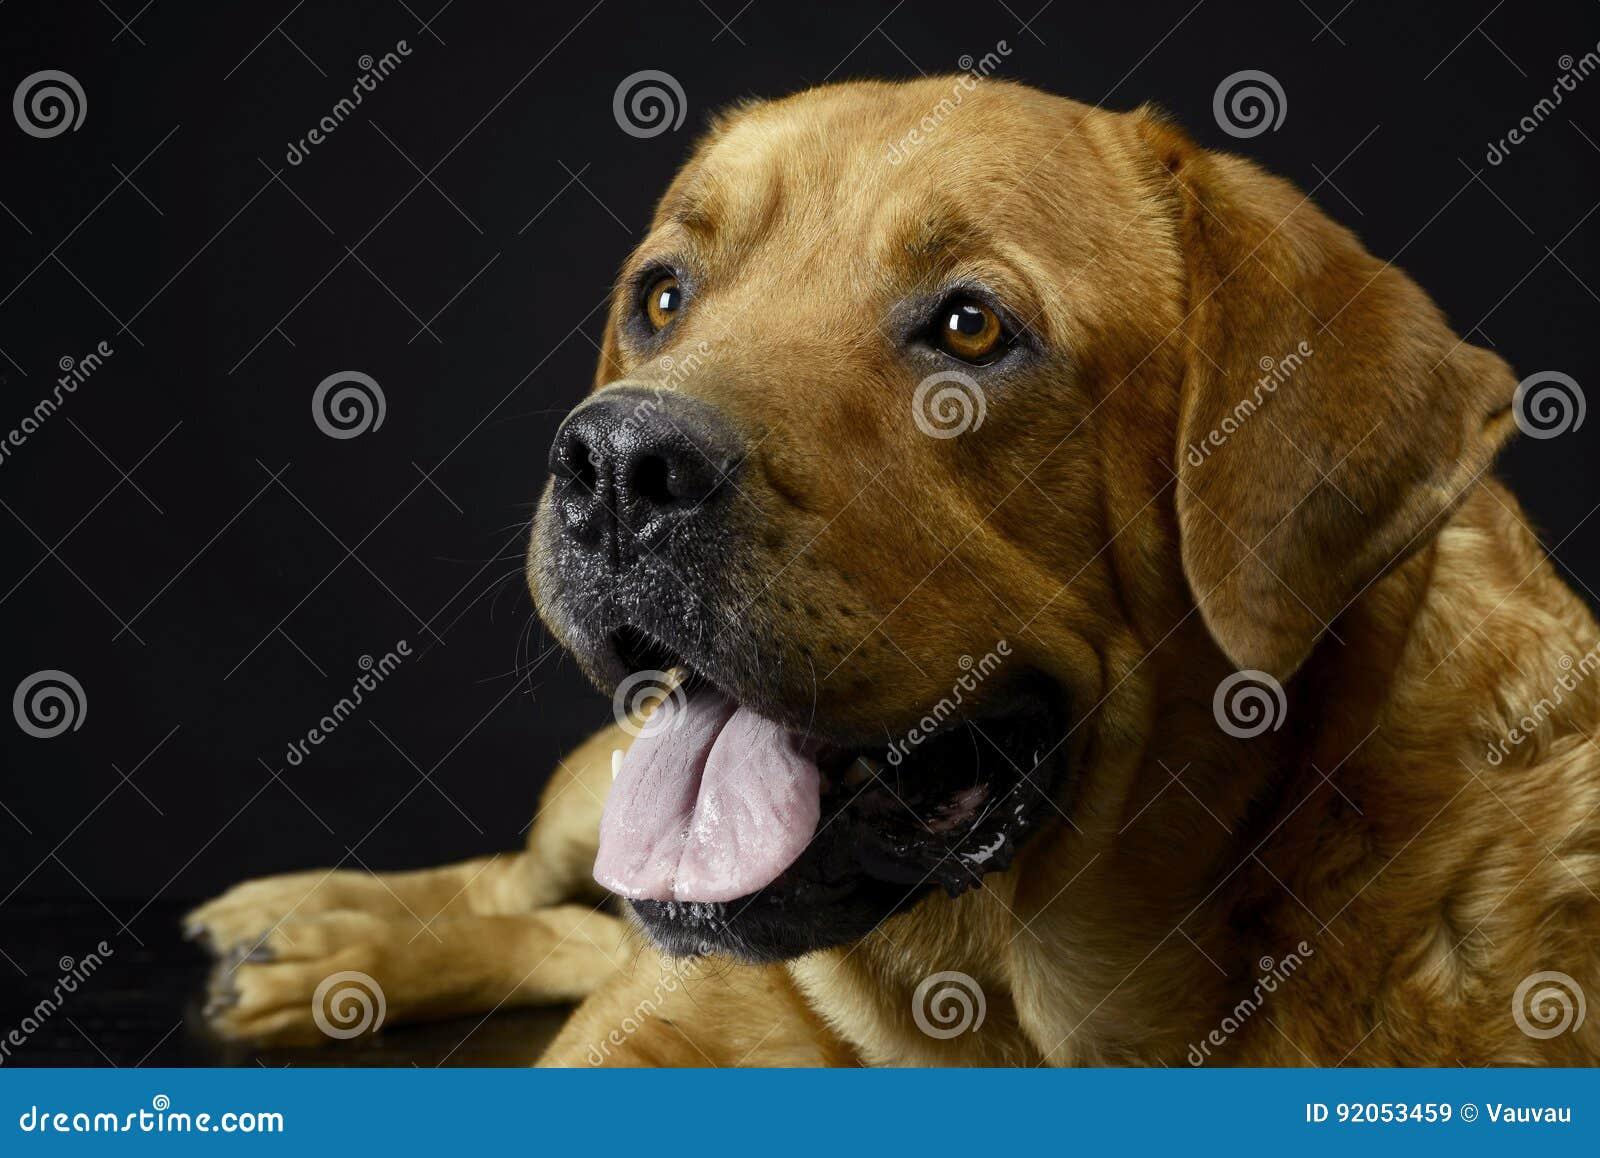 Labrador retriever portrait in black background studio